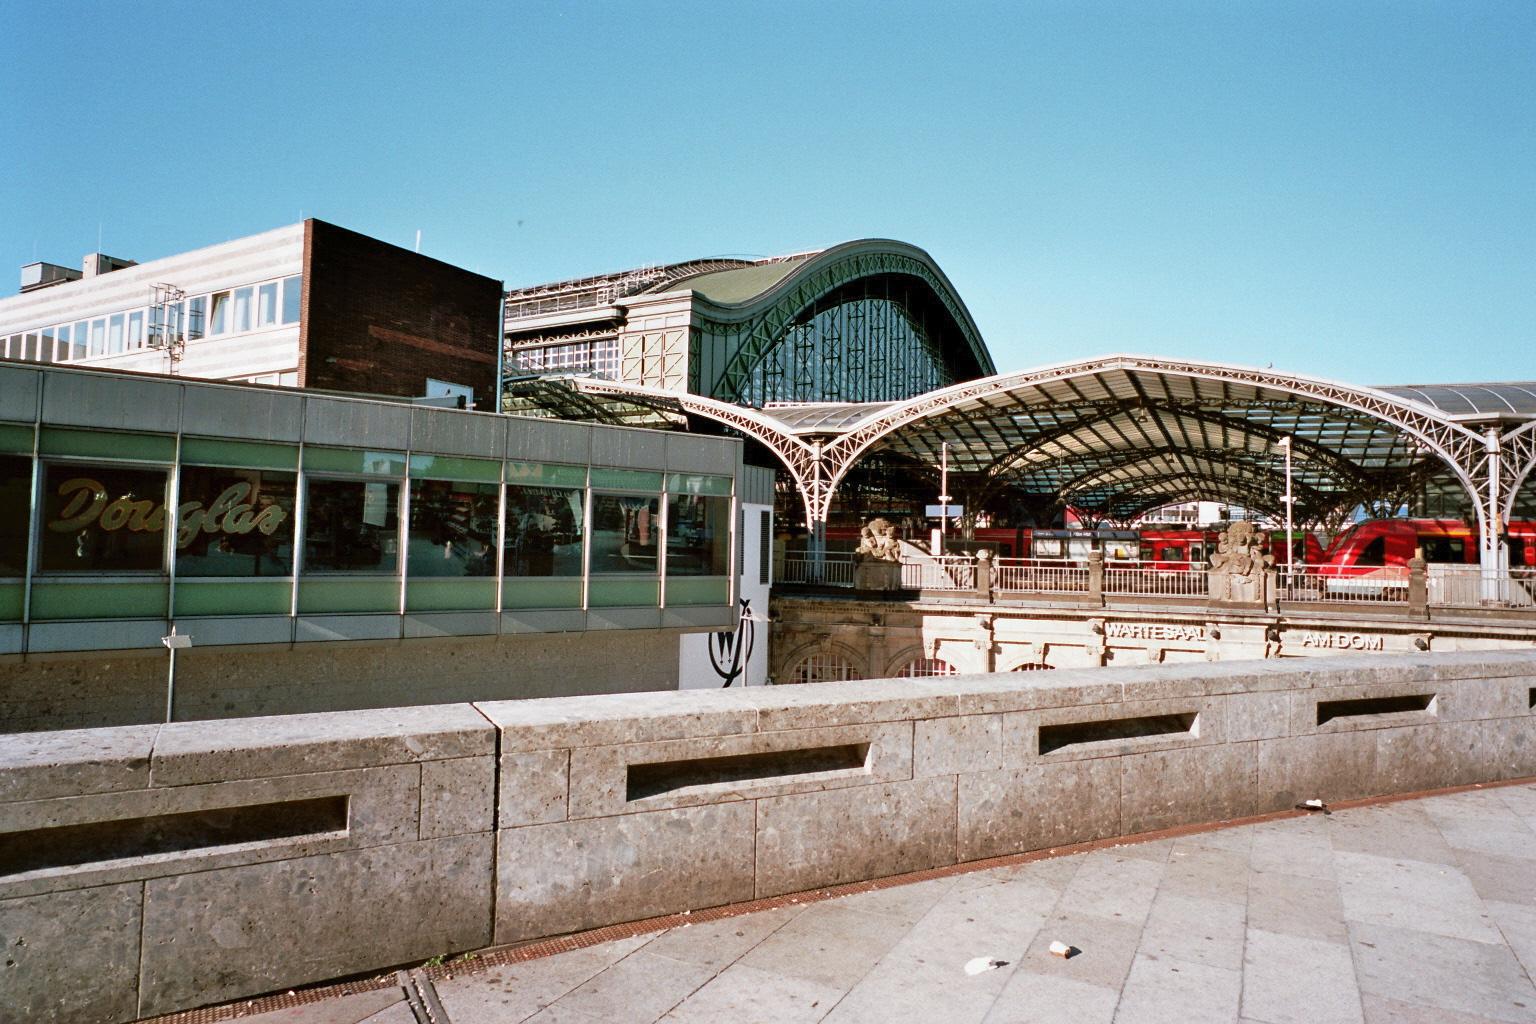 seidaris-photography-cologne_hauptbahnhof-analog-contax_g-kodak-01